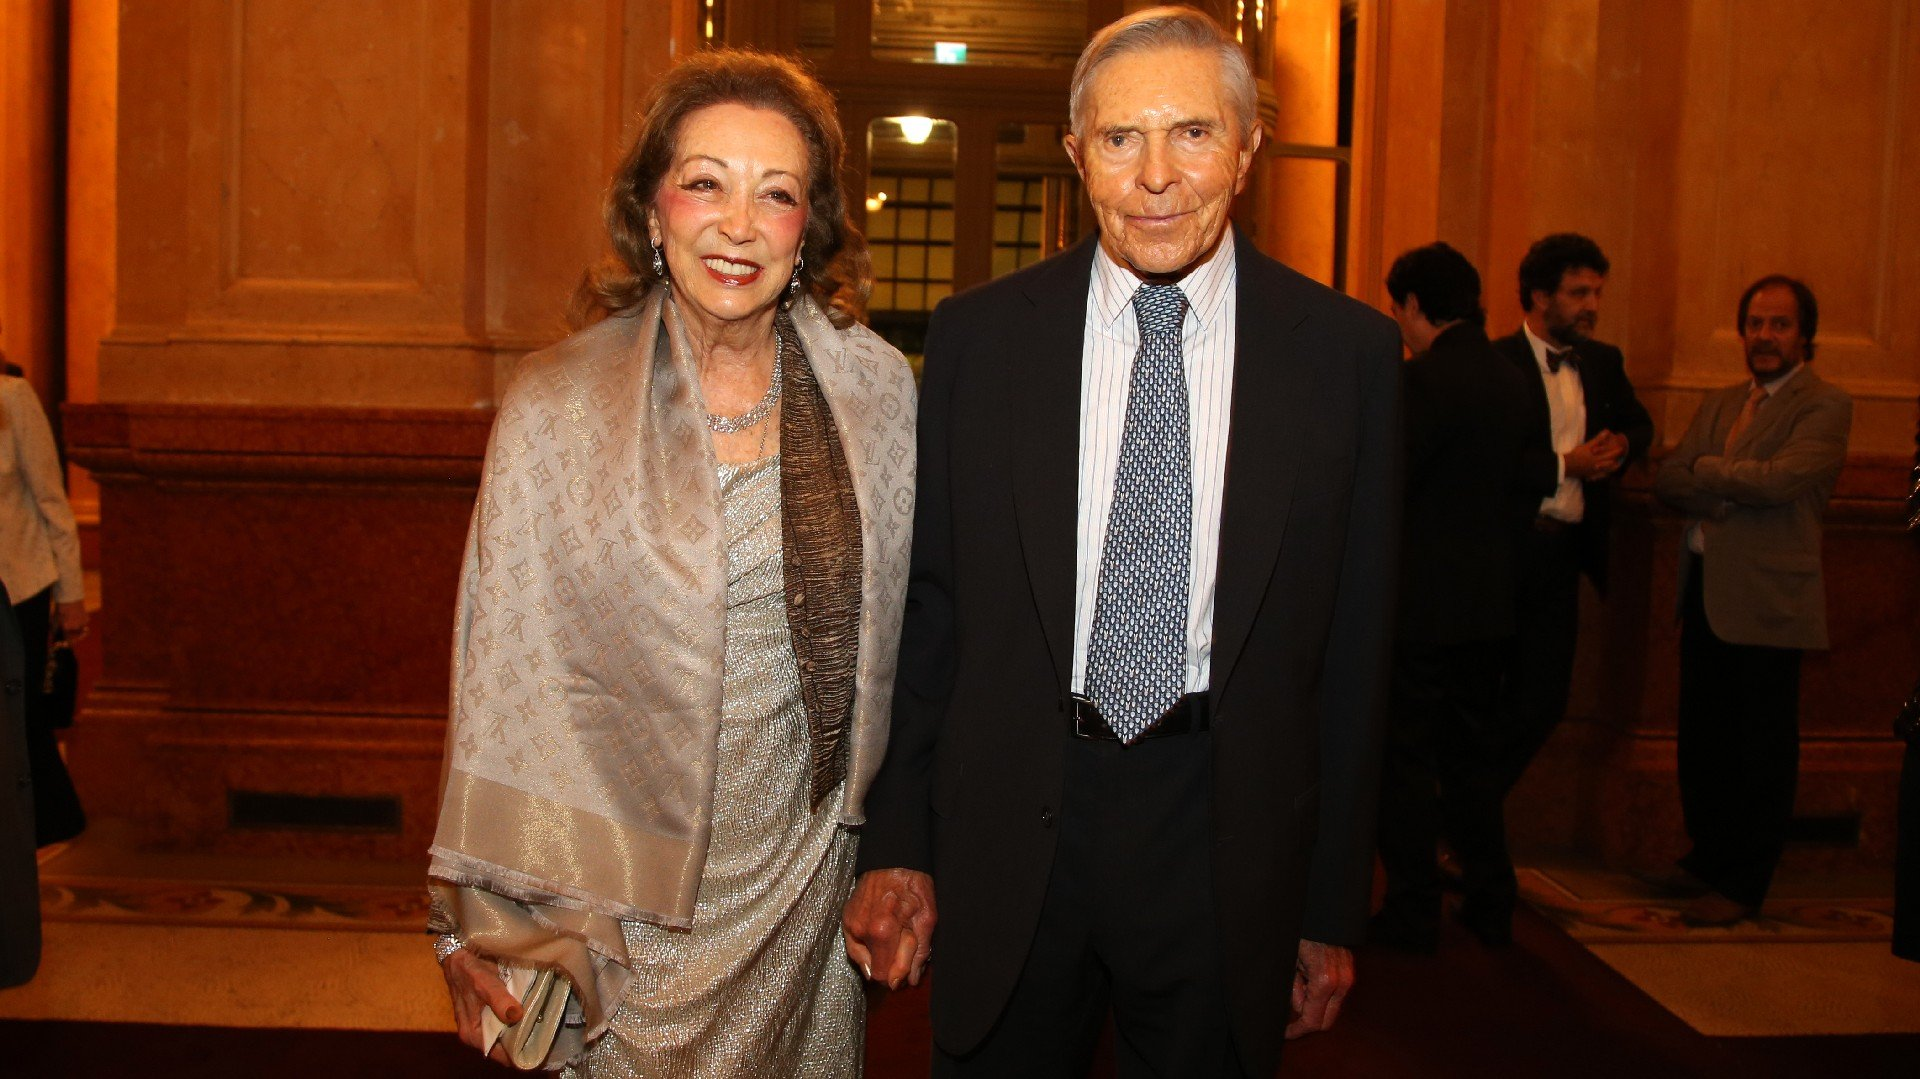 El empresarioAlberto W. Roemmers y Hebe Colman de Roemmers